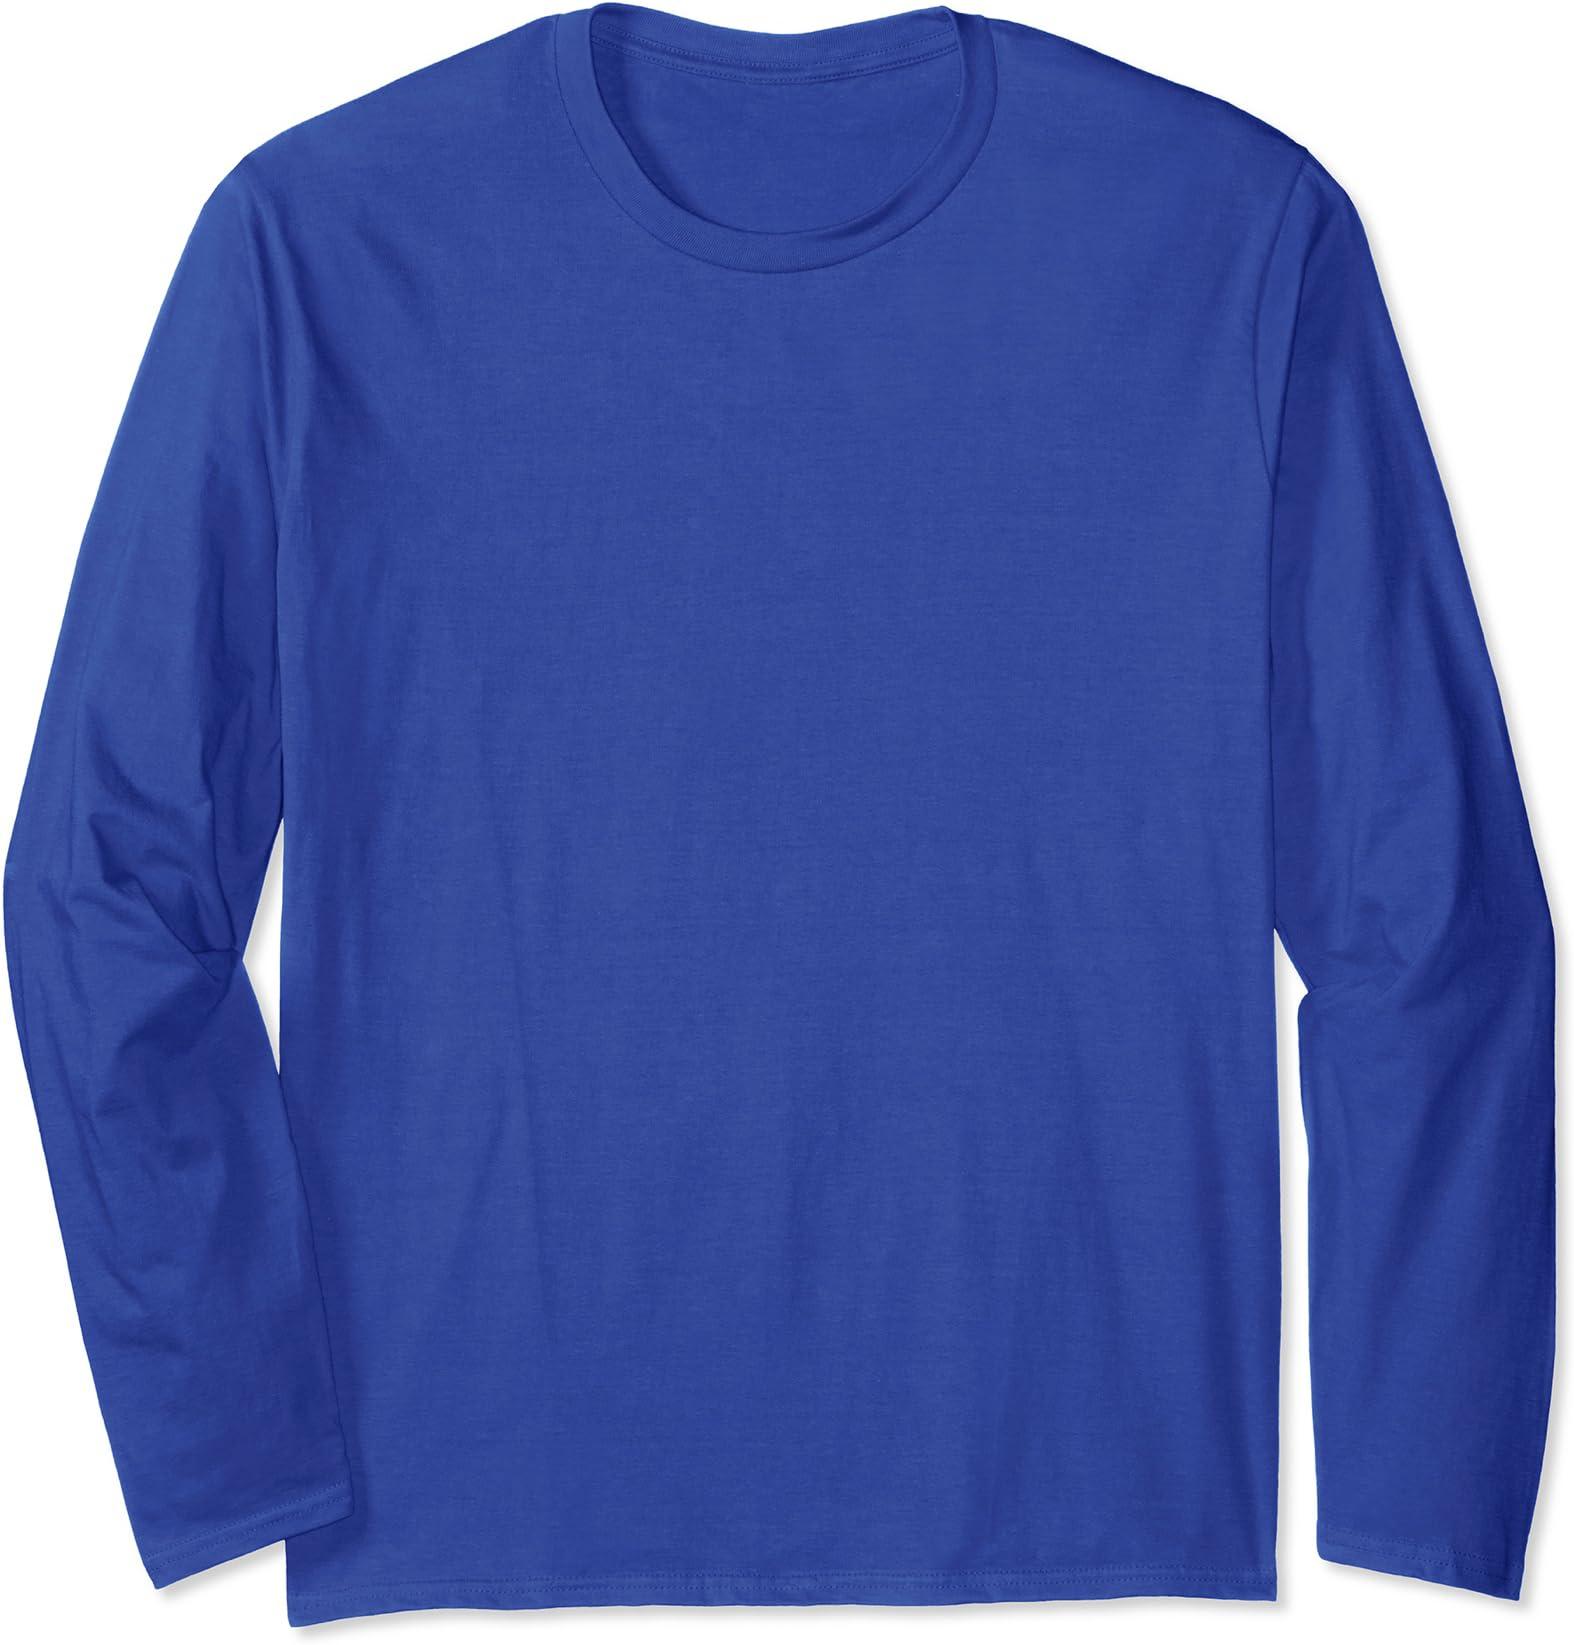 Funny Men/'s T-Shirt Clothing Top Gift Technician Evolution Of A Mechanic